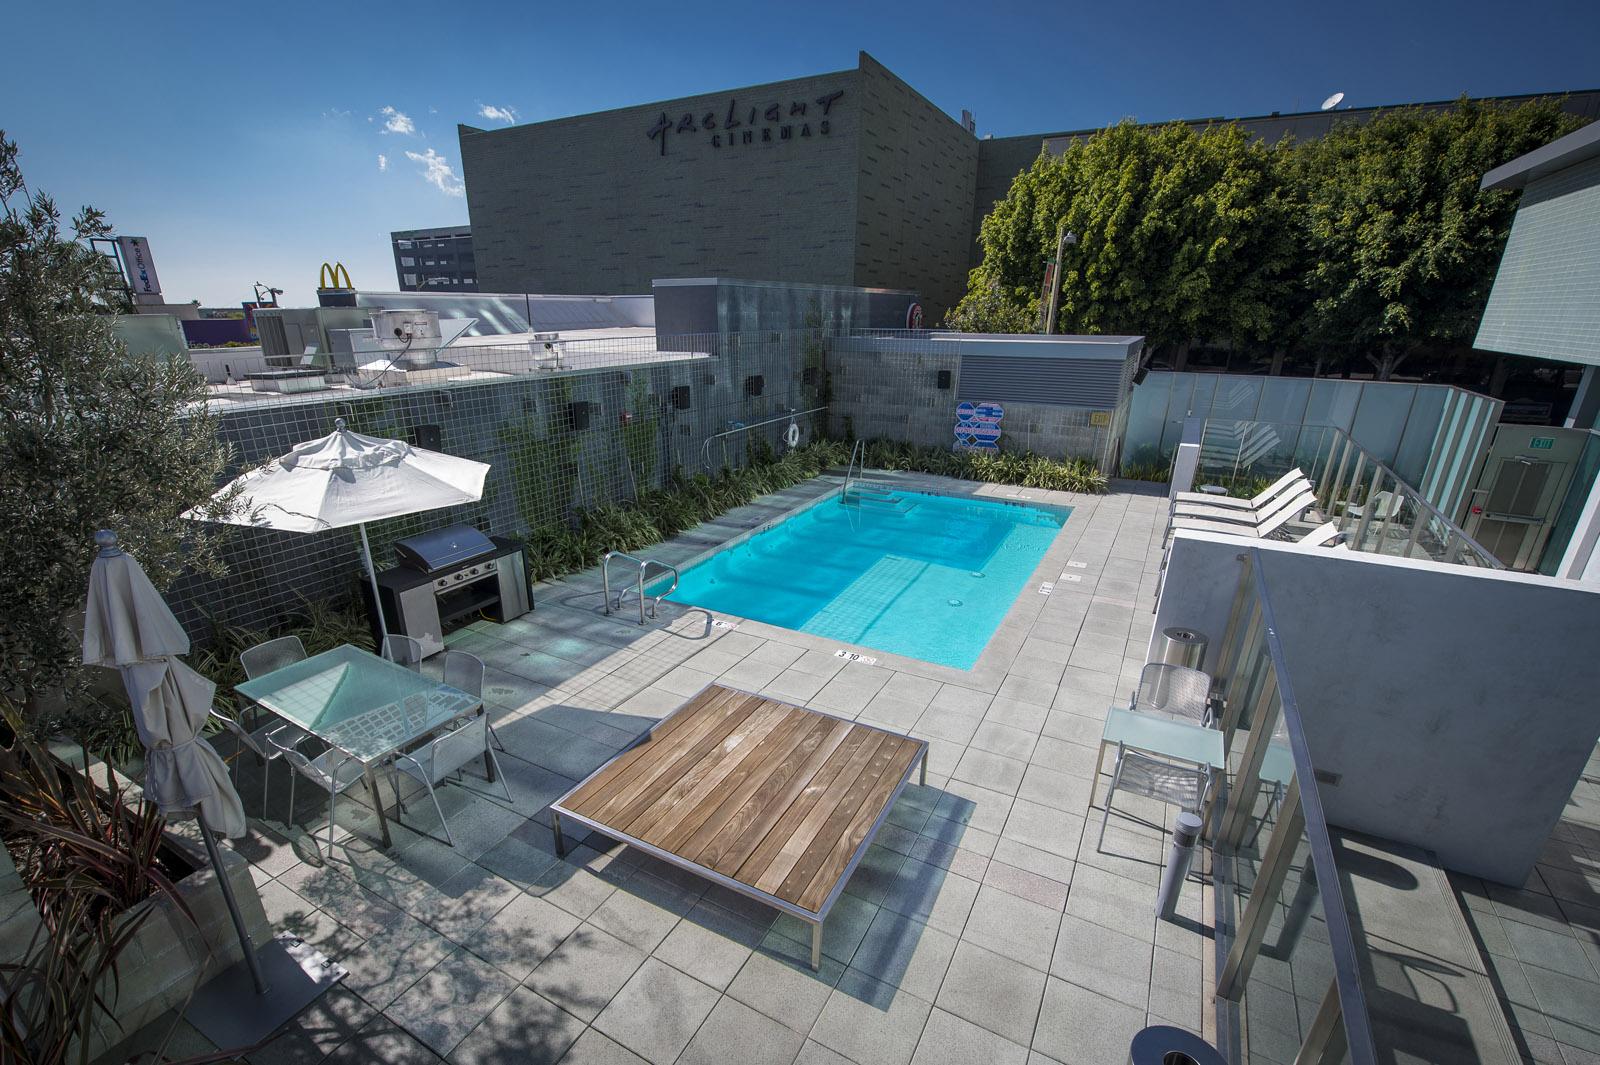 SRG Residential Awarded Management of High-Rise on Historic Sunset & Vine